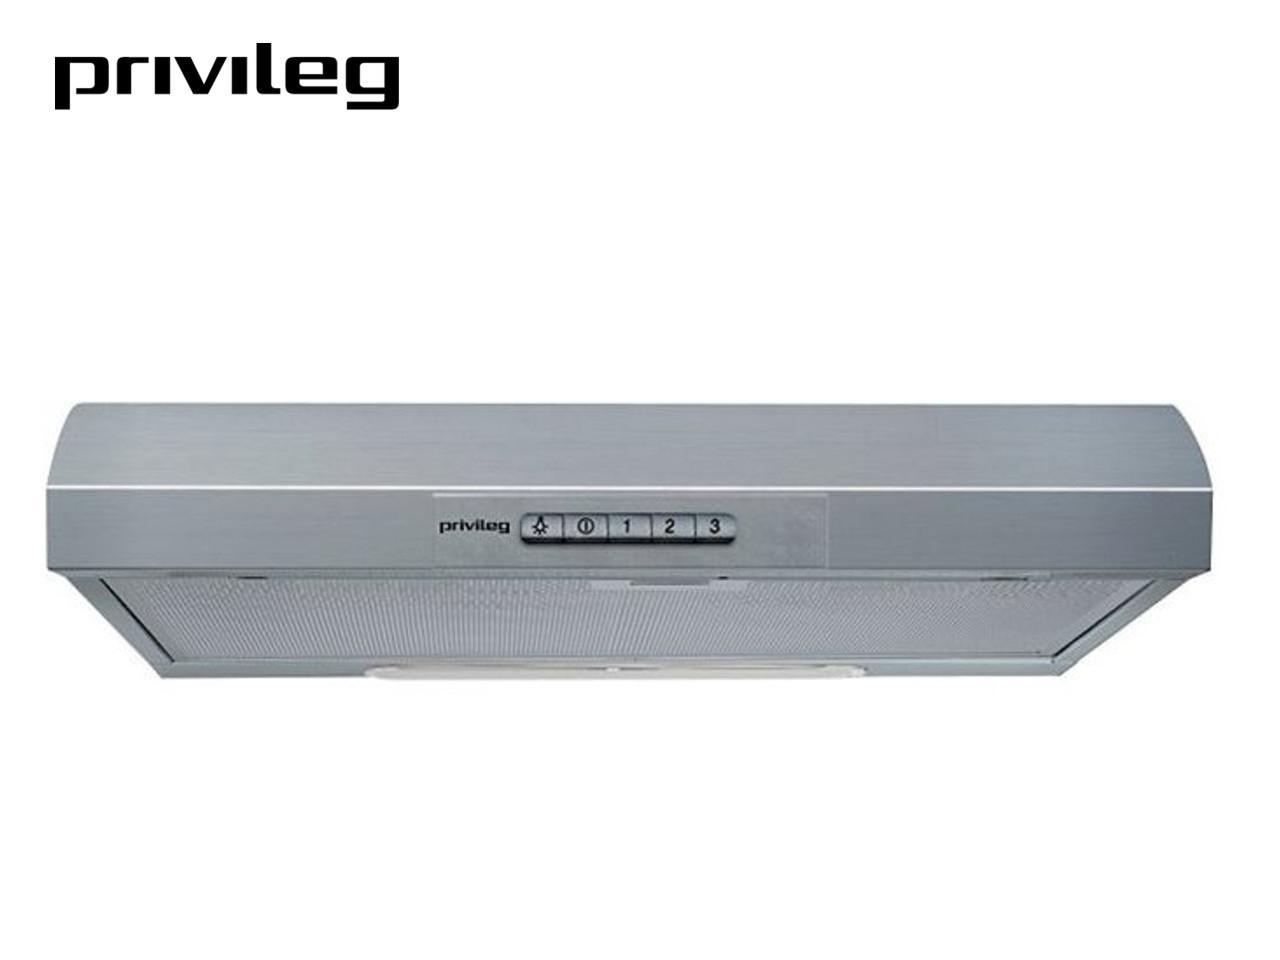 PRIVILEG PCHN 212460 X, šíře 60 cm | CHAT on-line podpora PO-PÁ 8-22.00!!